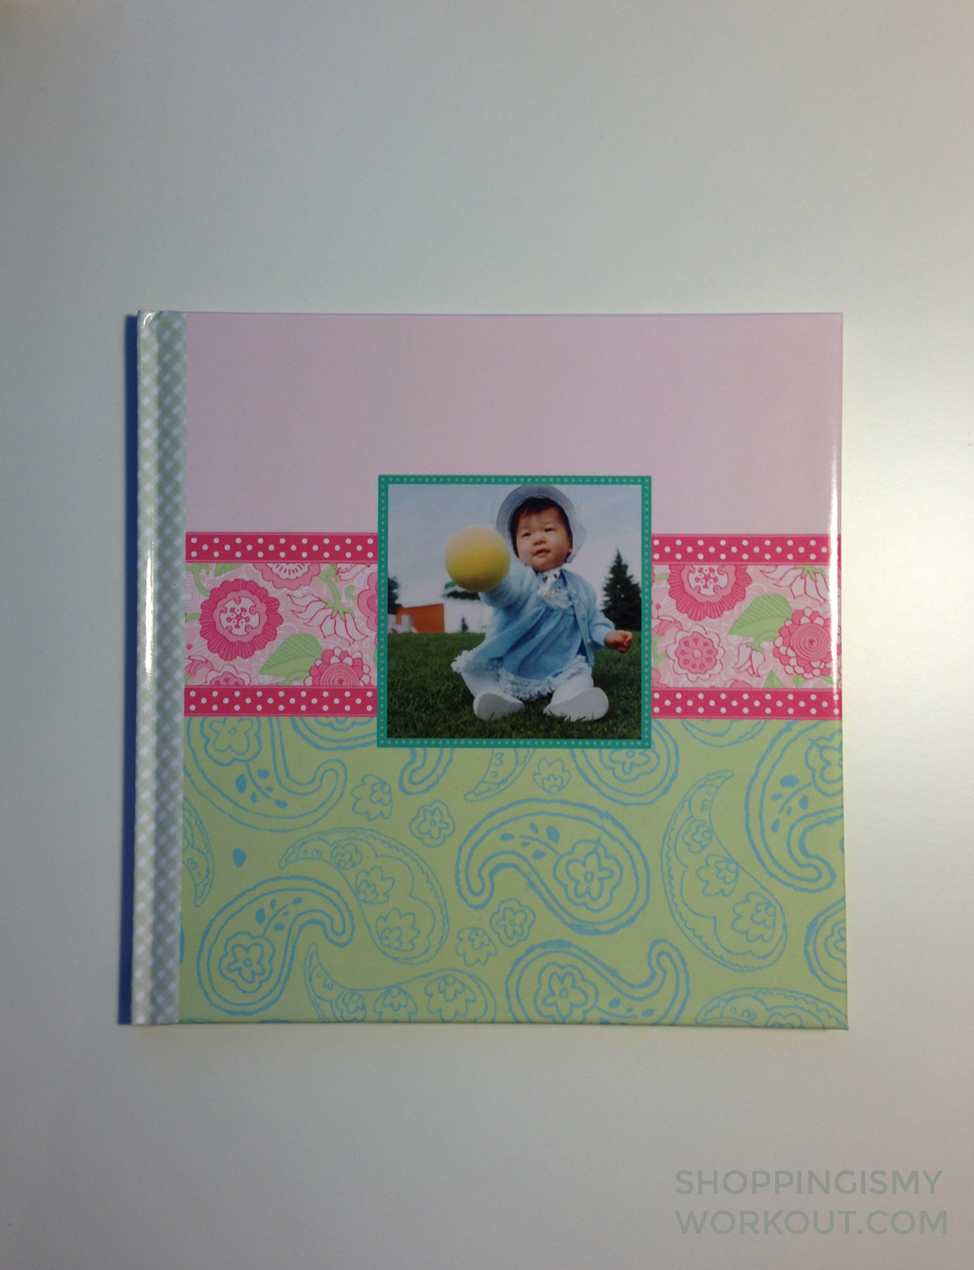 Shutterfly Hardcover Photobook Glossy Cover